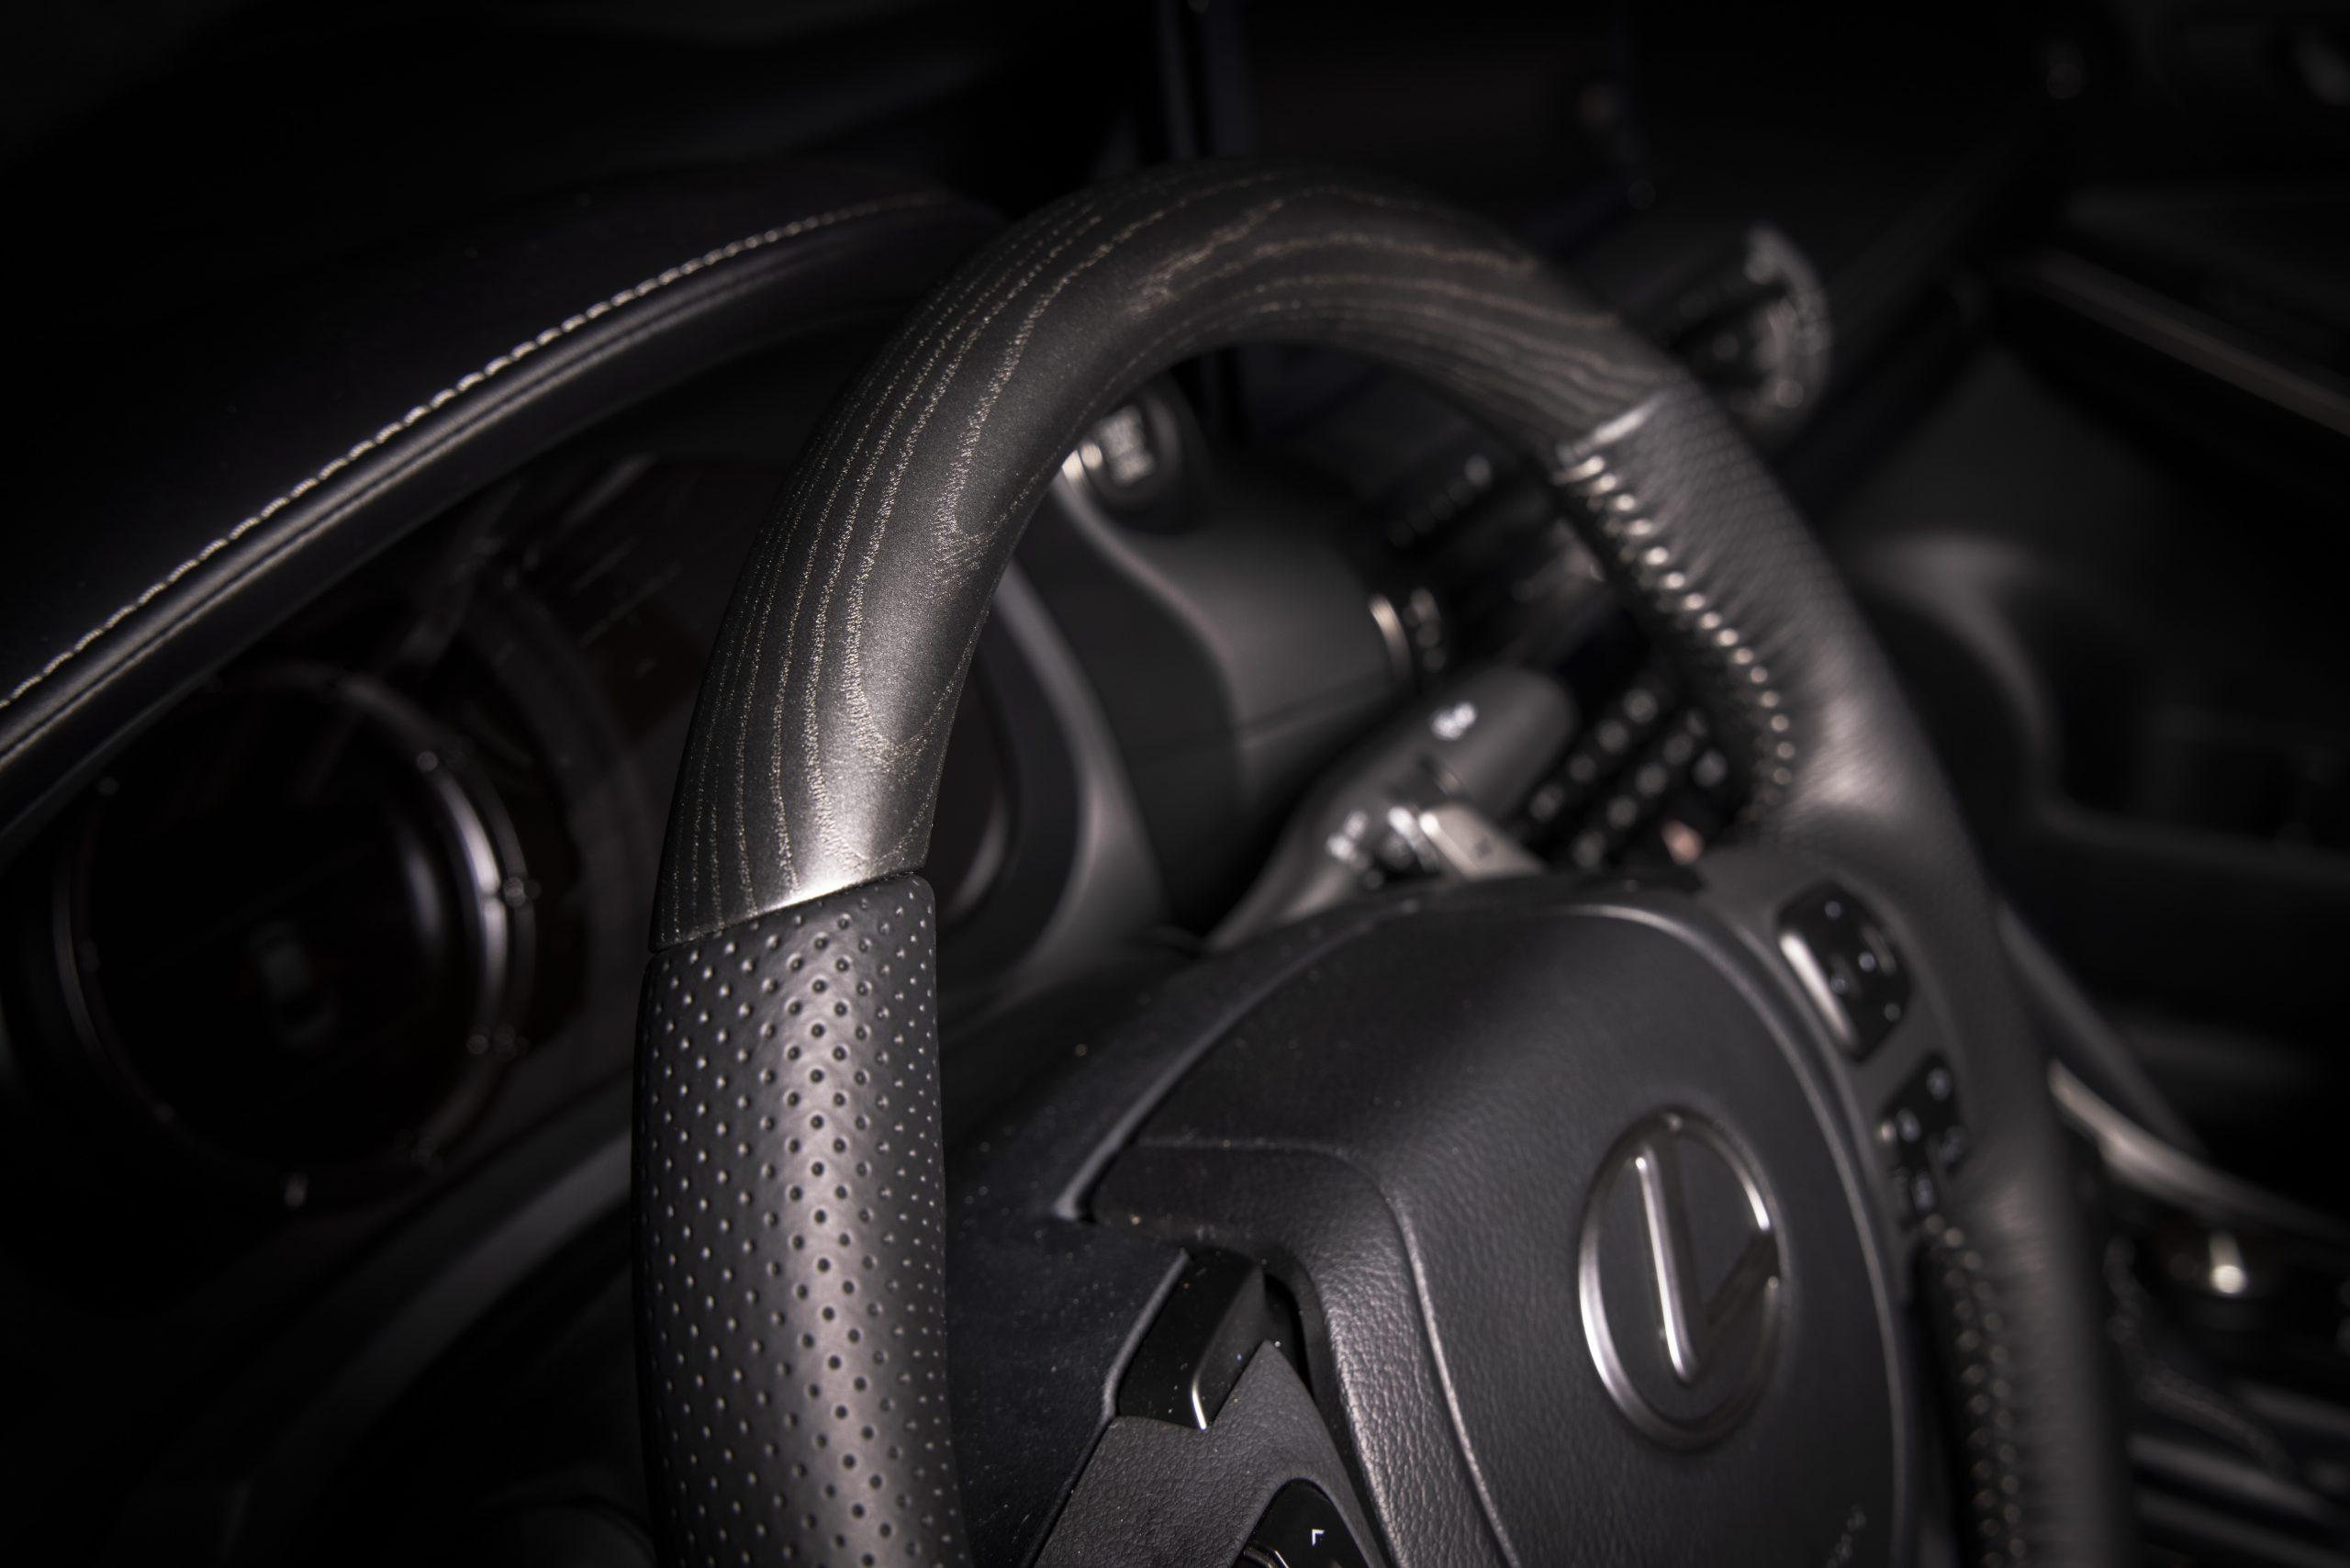 2022 Lexus IS 500 F Sport Launch Edition steering wheel detail